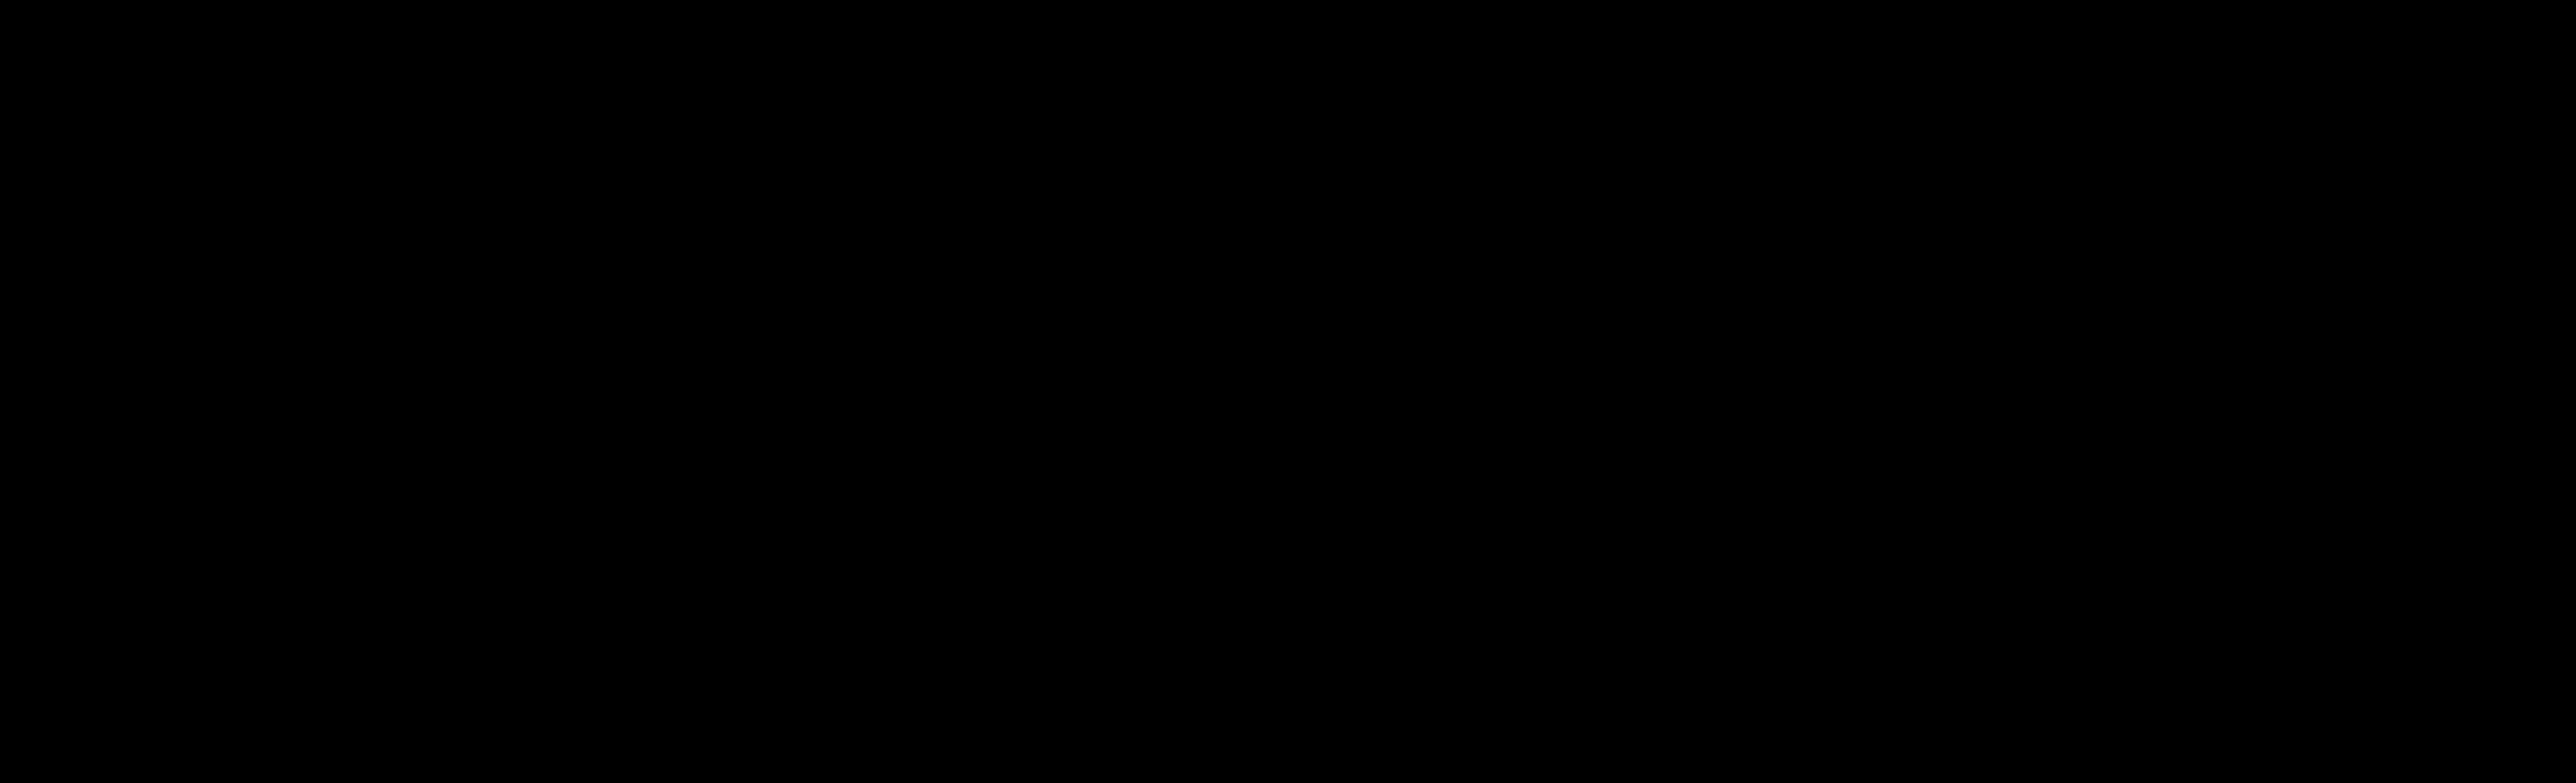 Mecano ID